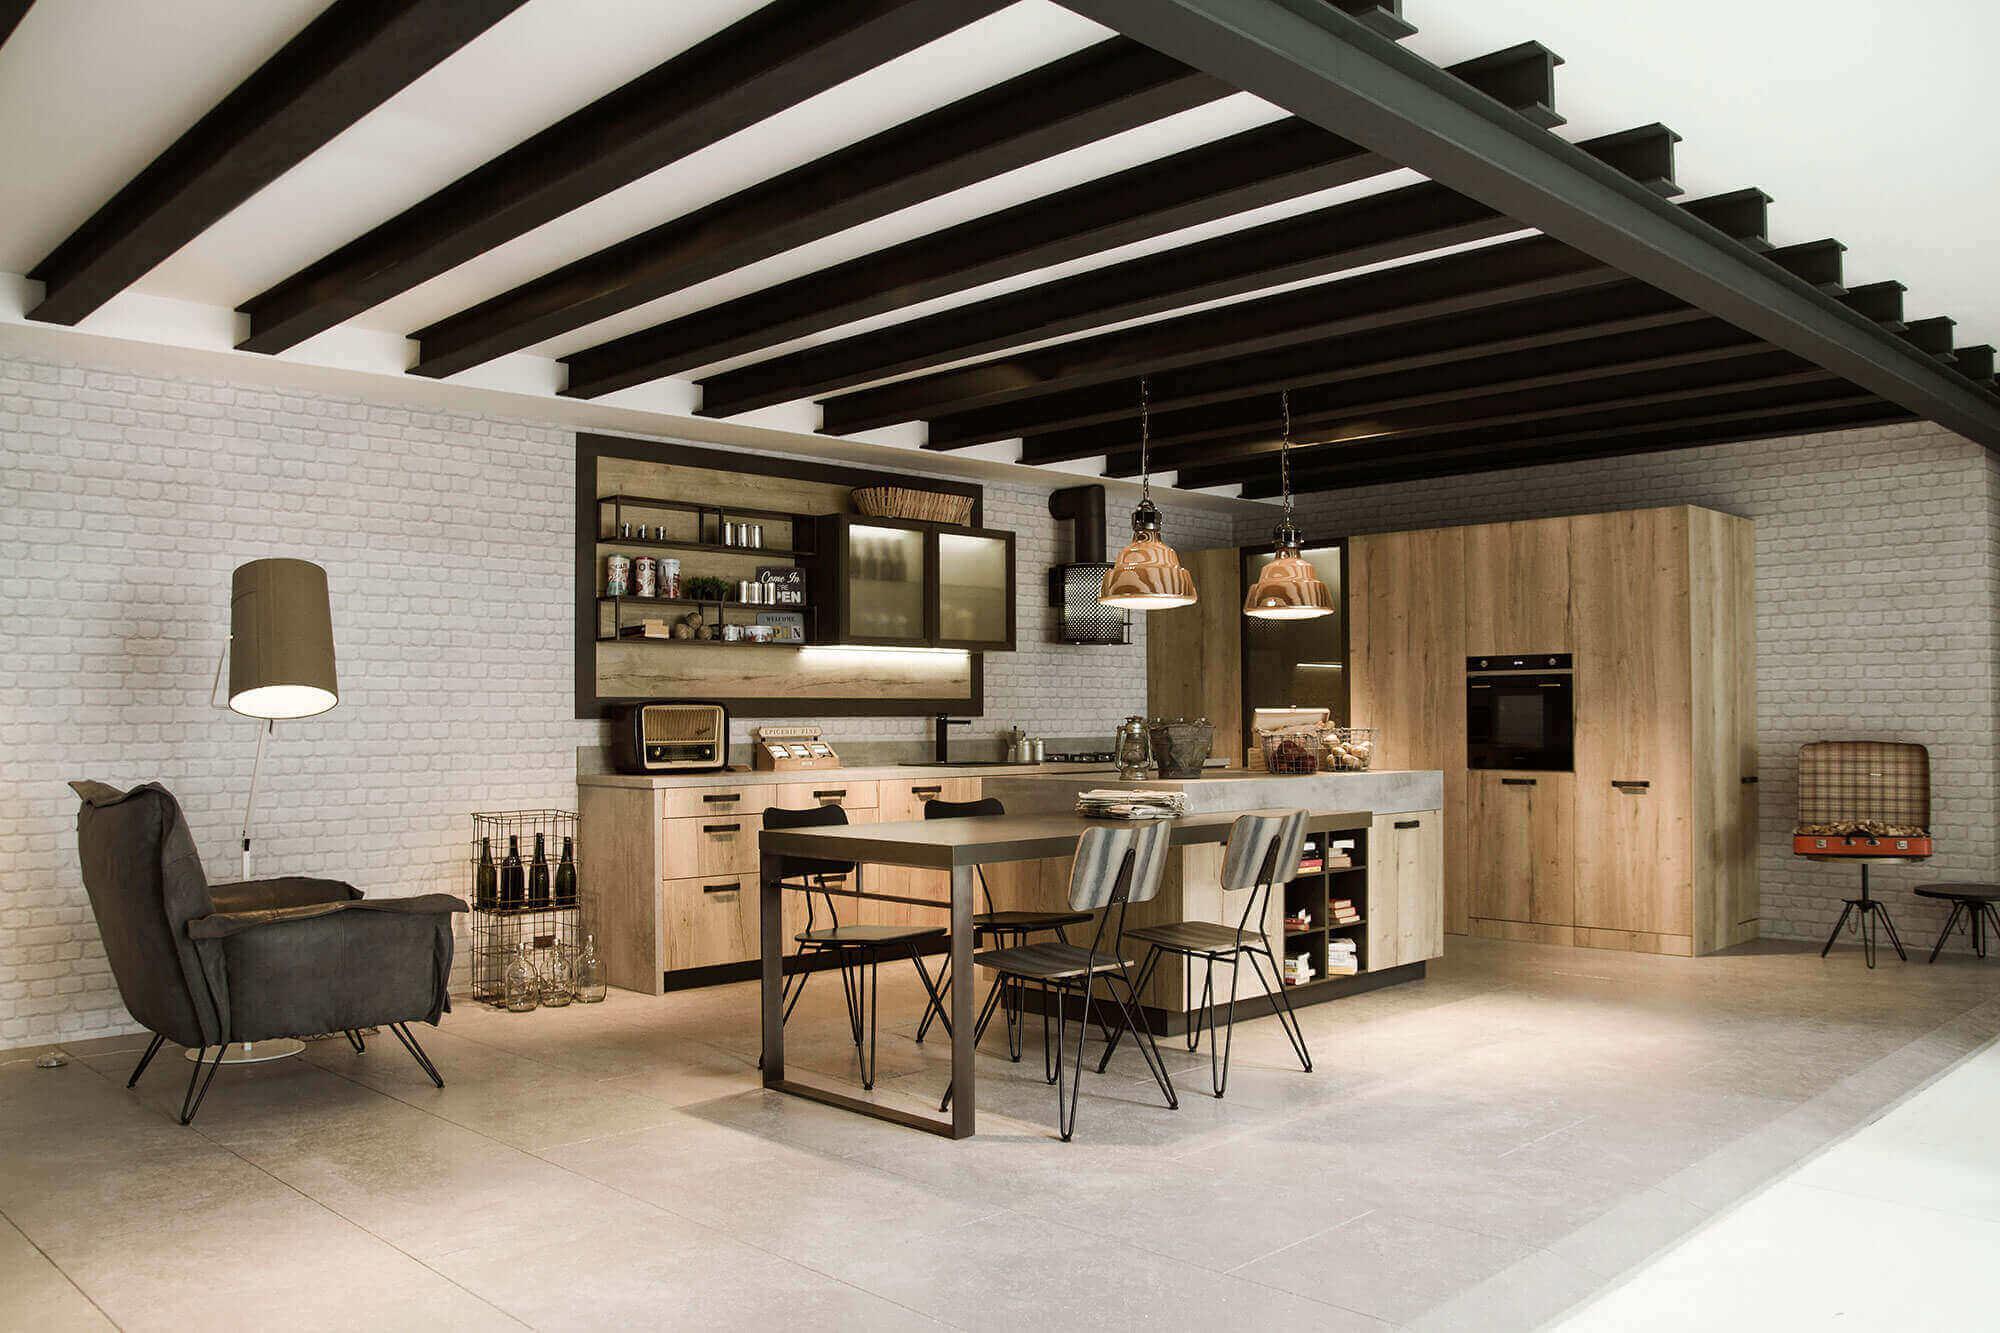 Industriële keukens van Tieleman Keukens